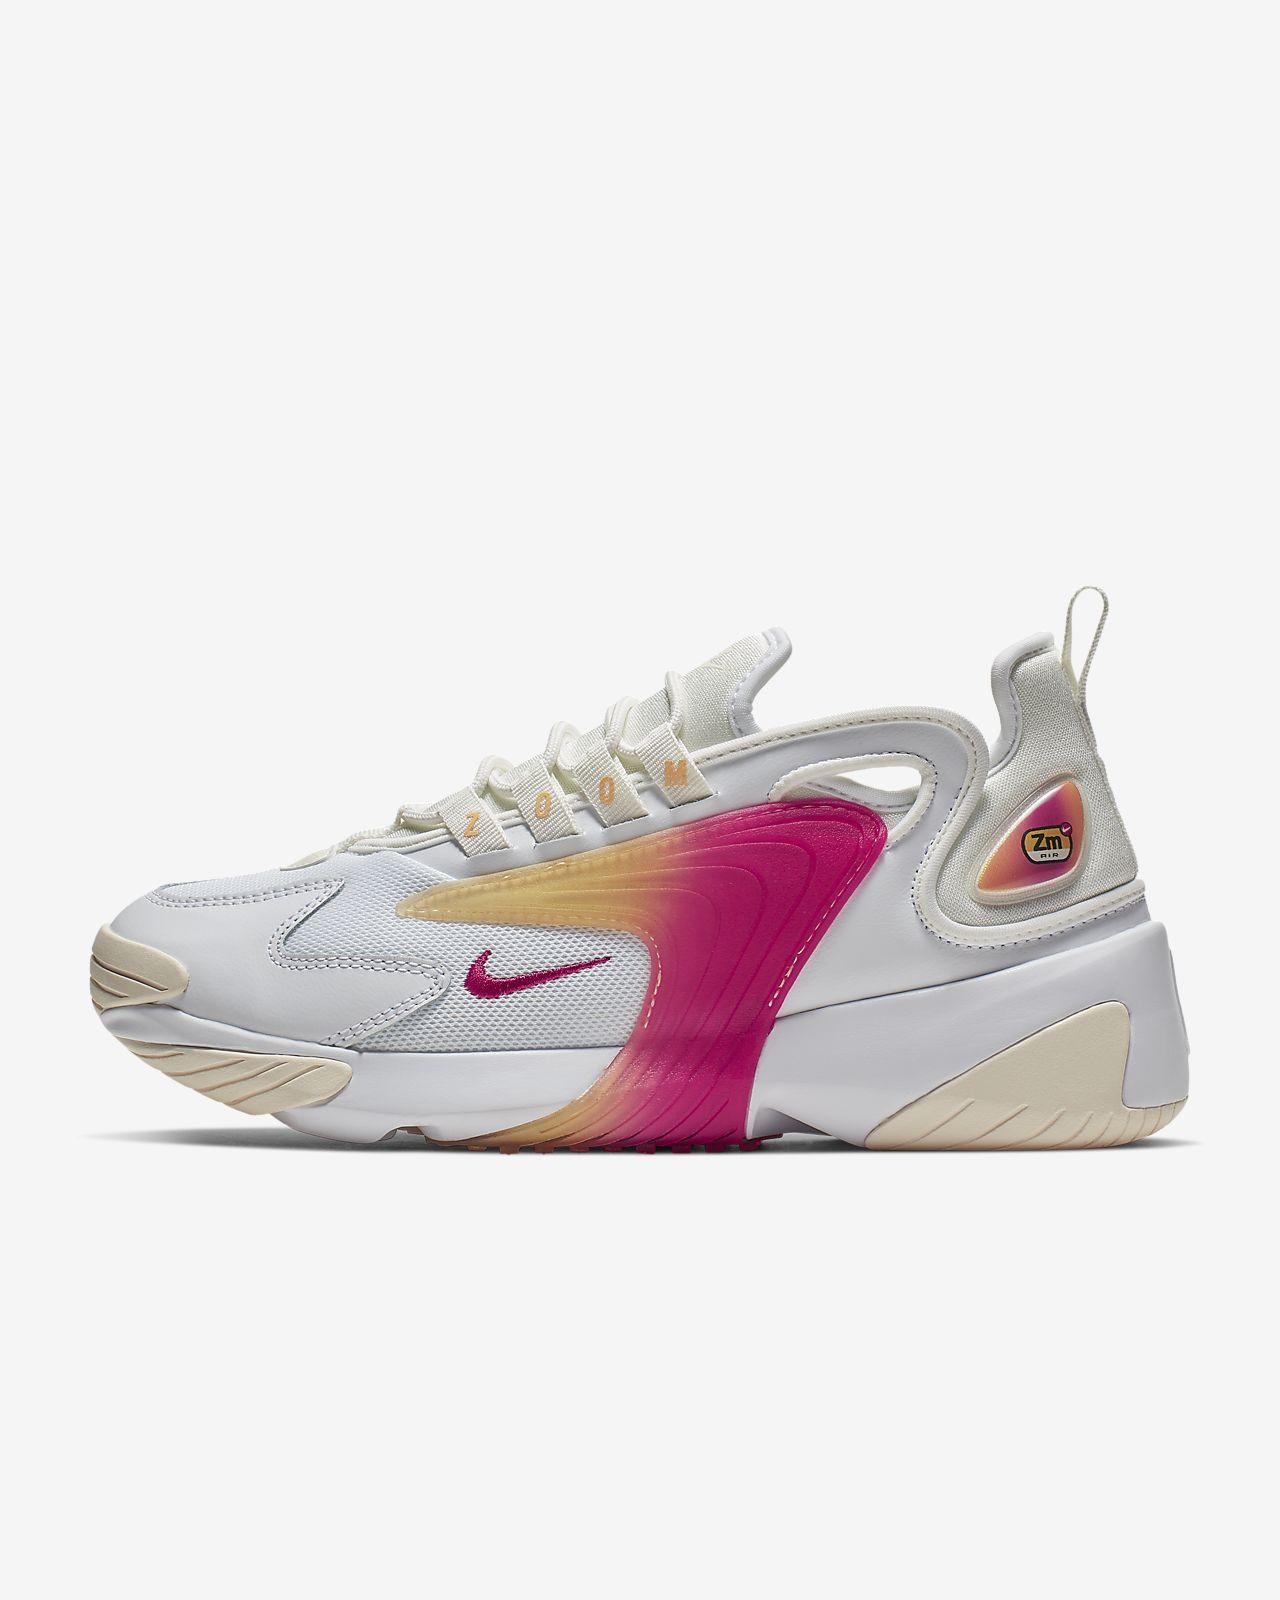 51a044ca705 Женские кроссовки Nike Zoom 2K. Nike.com RU